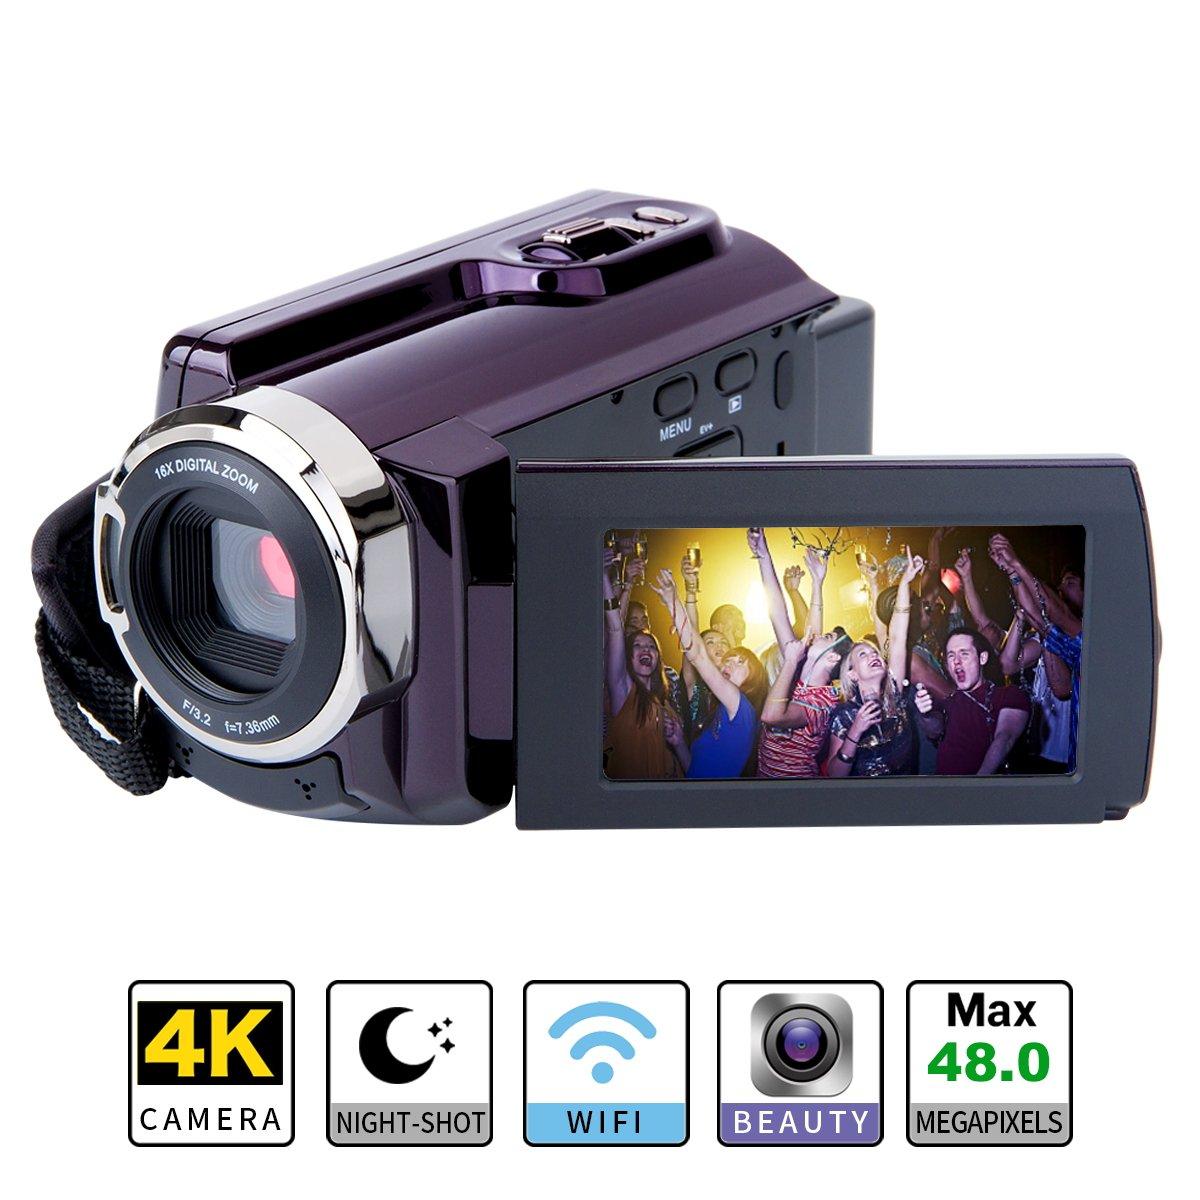 4K Camcorder WIFI Camera Kimire Ultra HD Digital Camera 48.0MP Video Recorder 3.0 Inch 270 Degree Rotation Capacitive Touch Screen Night Vision 16X Digital Zoom Camcorder(HDV-534K)